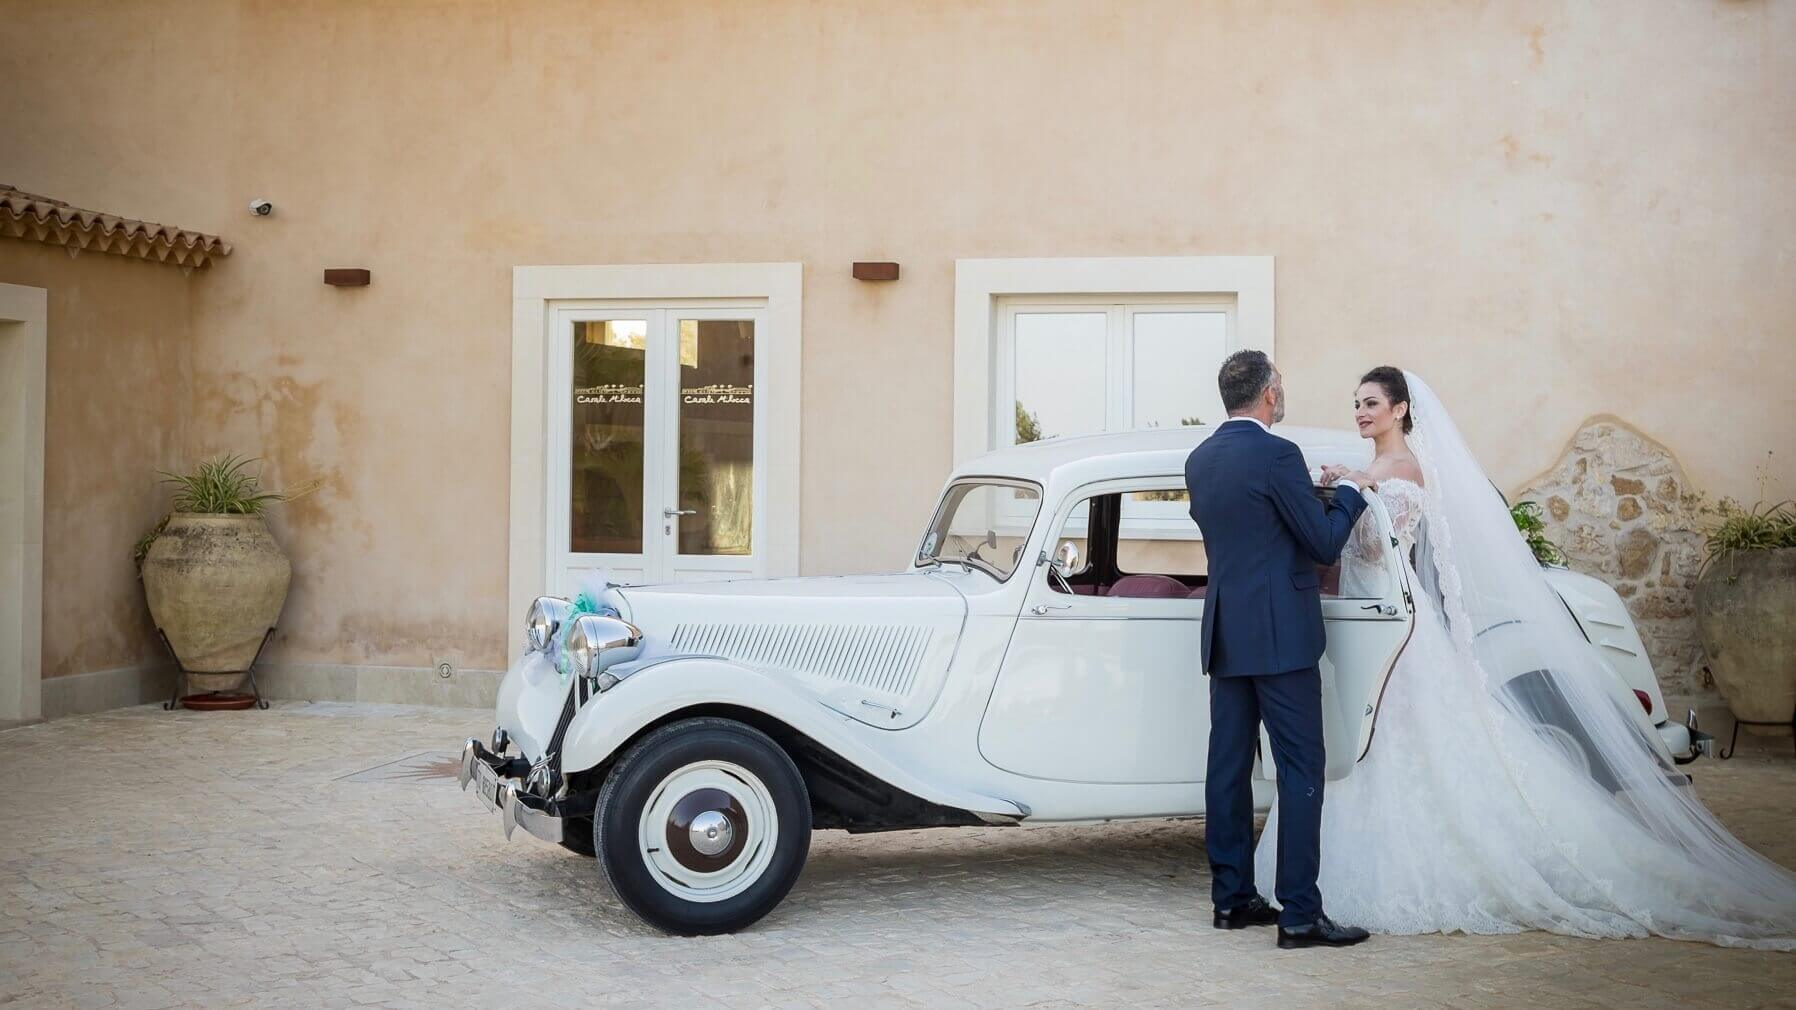 Matrimoni, wedding, hotel a siracusa casale milocca